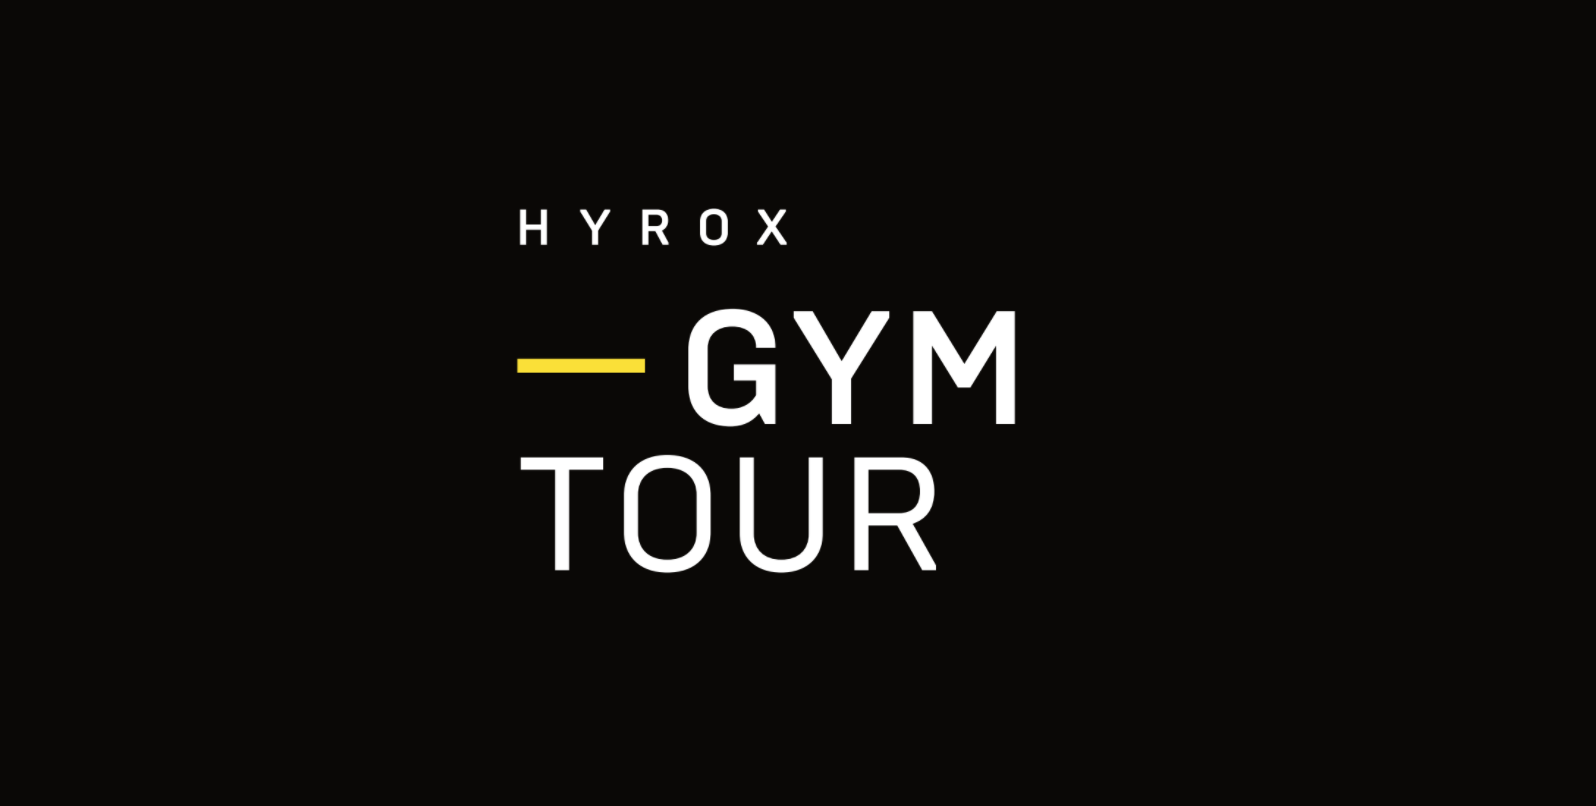 HYROX Gym Tour - Frankfurt